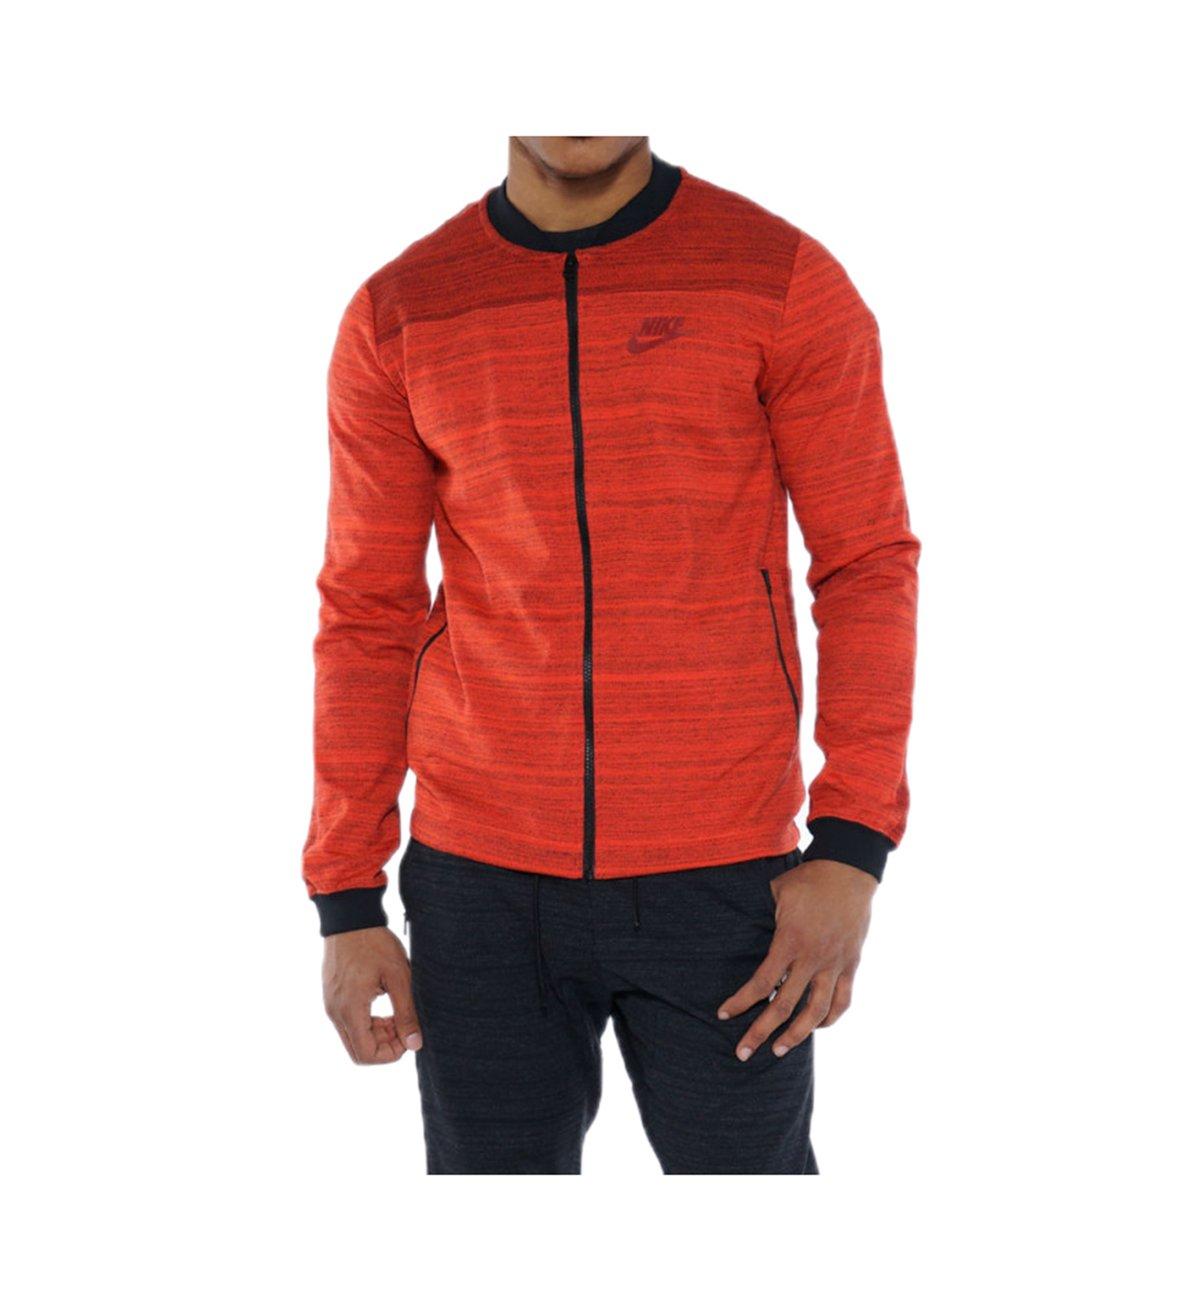 Nike Men's Sportswear Advance 15 Knit Jacket (Medium, Max Orange) by NIKE (Image #1)